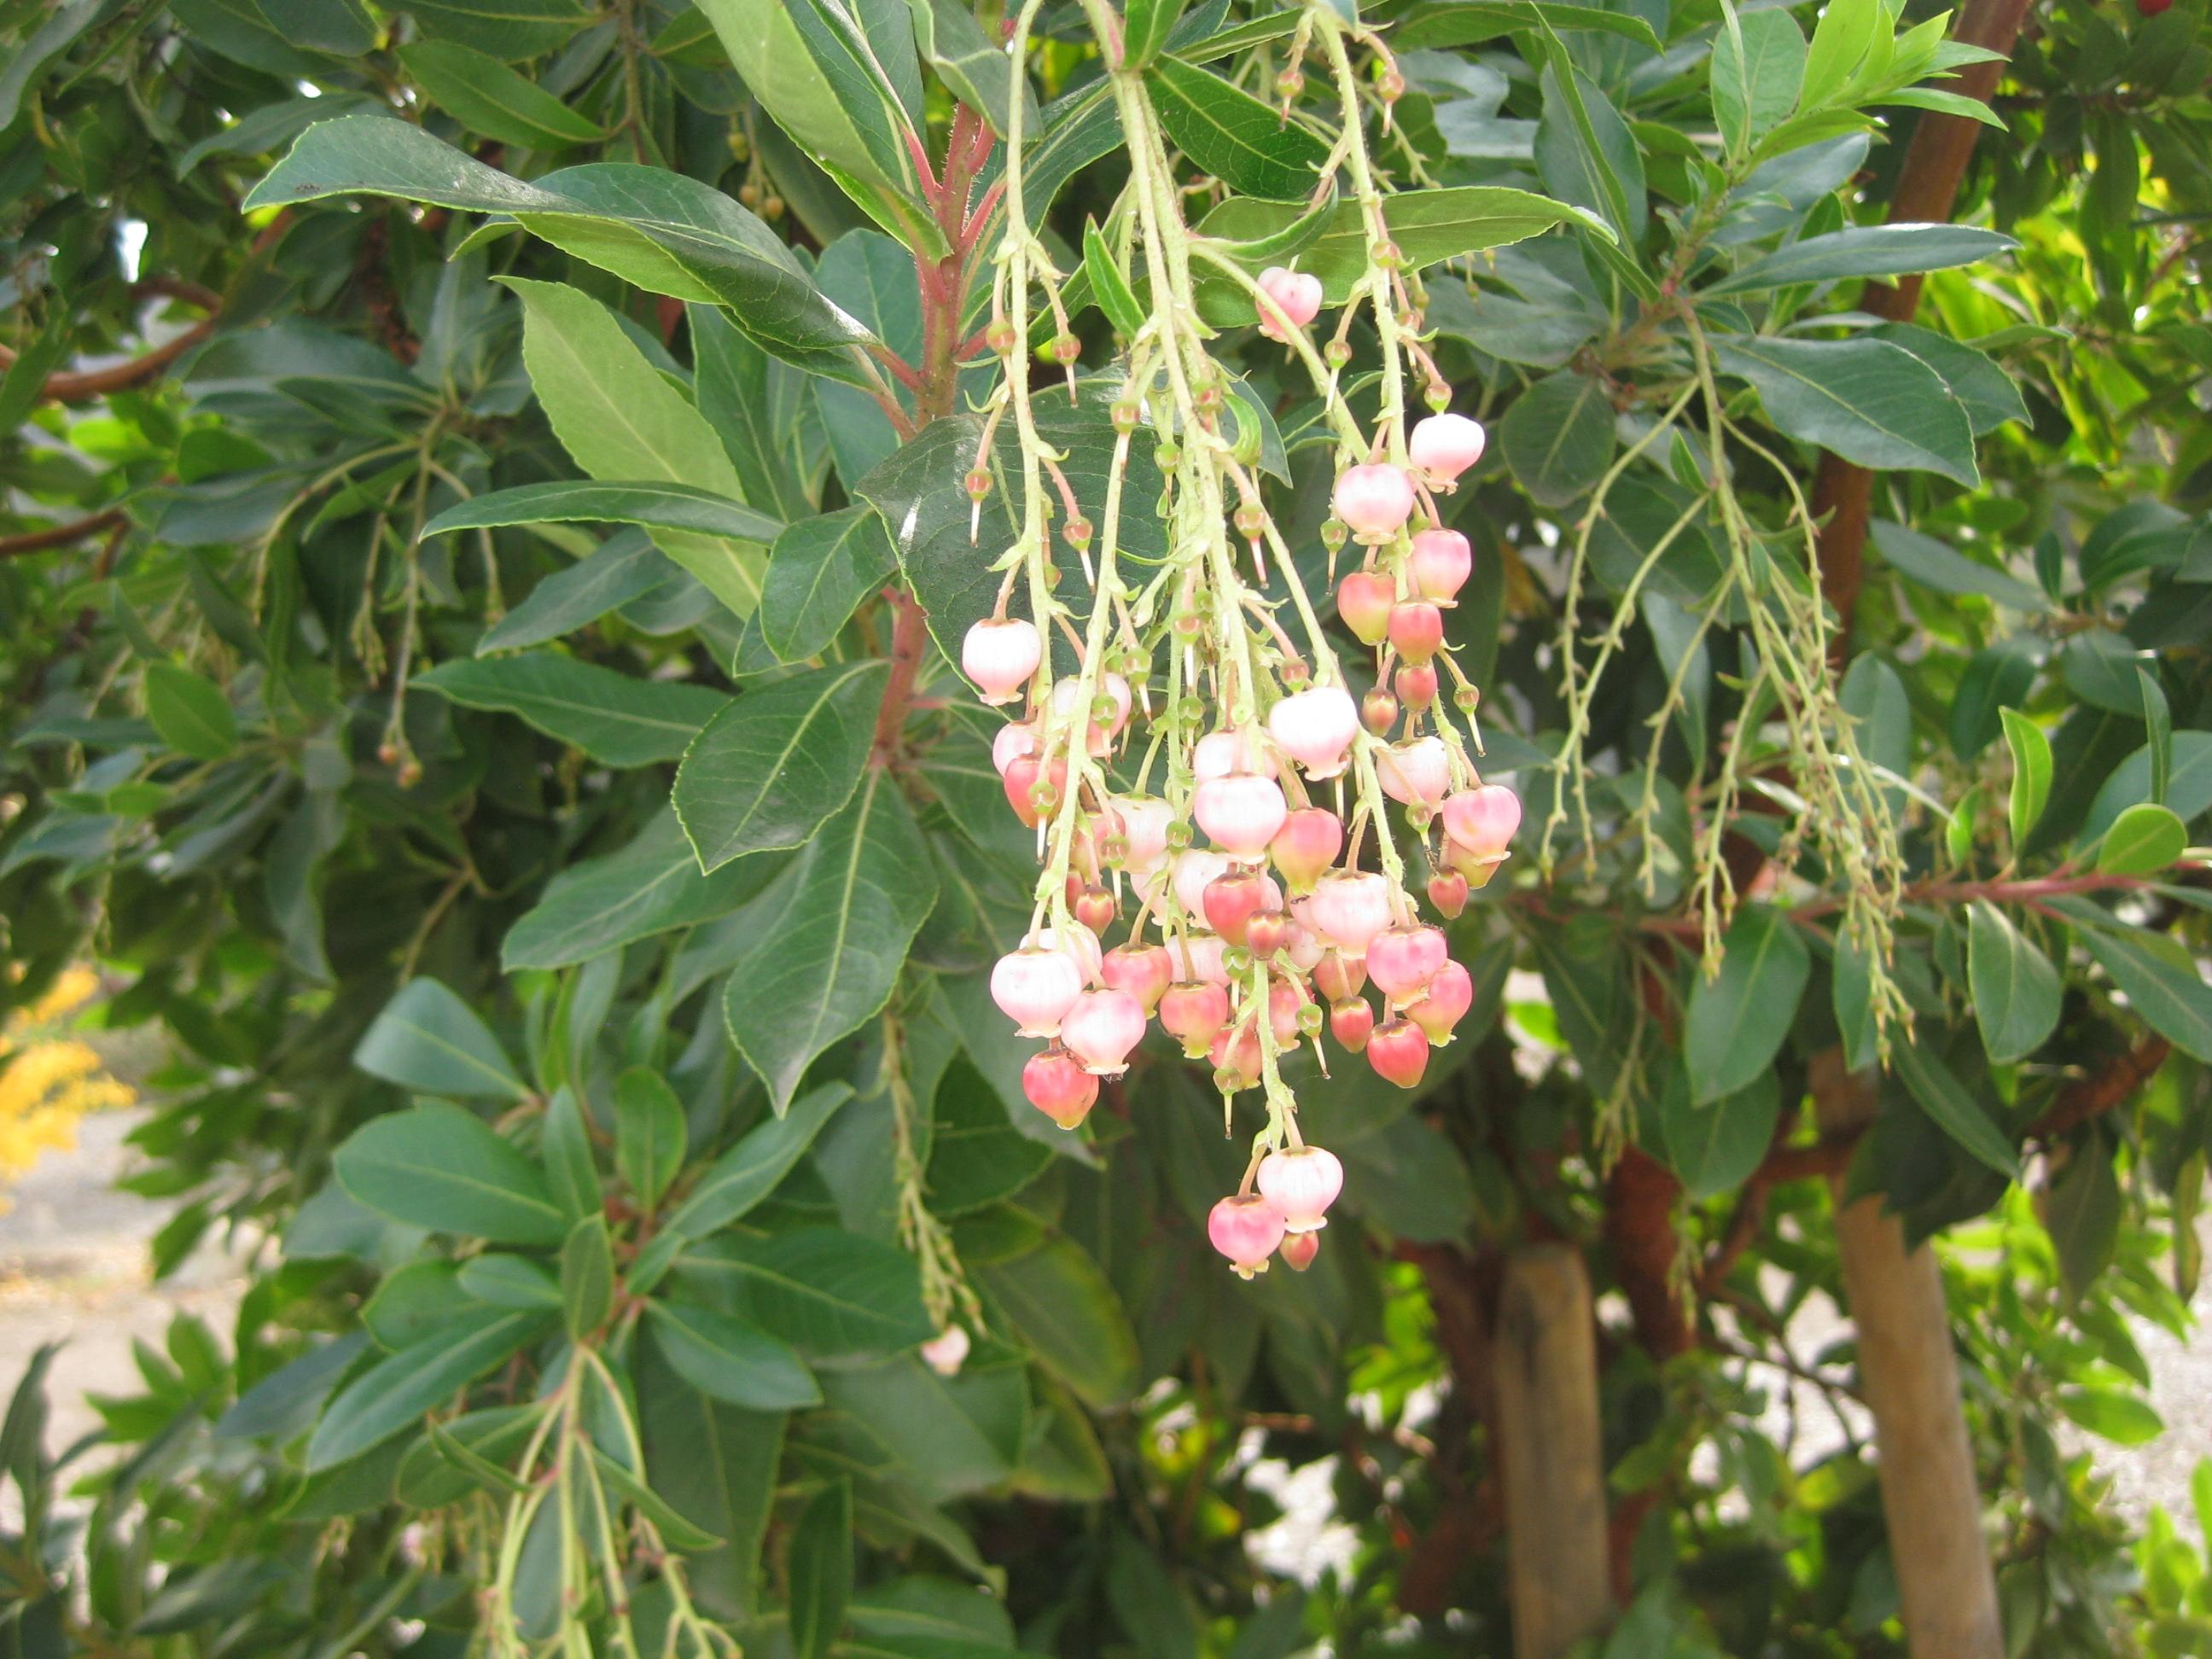 arbutus marina strawberry tree - photo #29